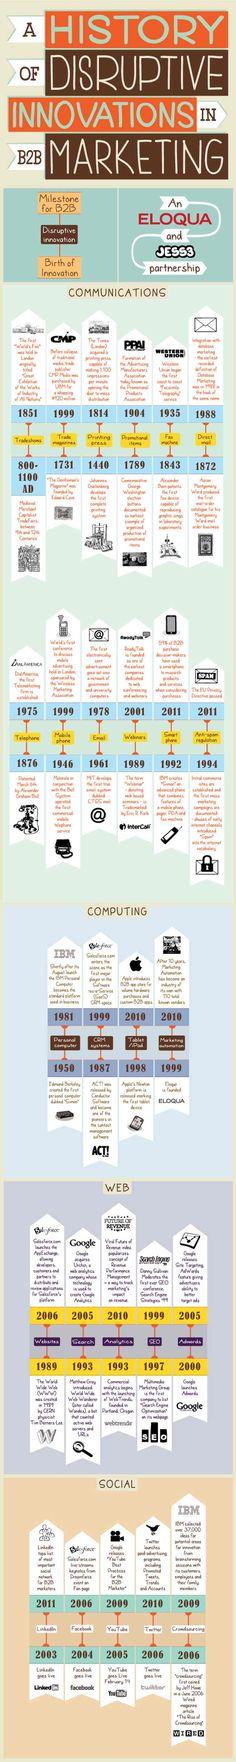 A History Of Disruptive B2B Marketing Innovations